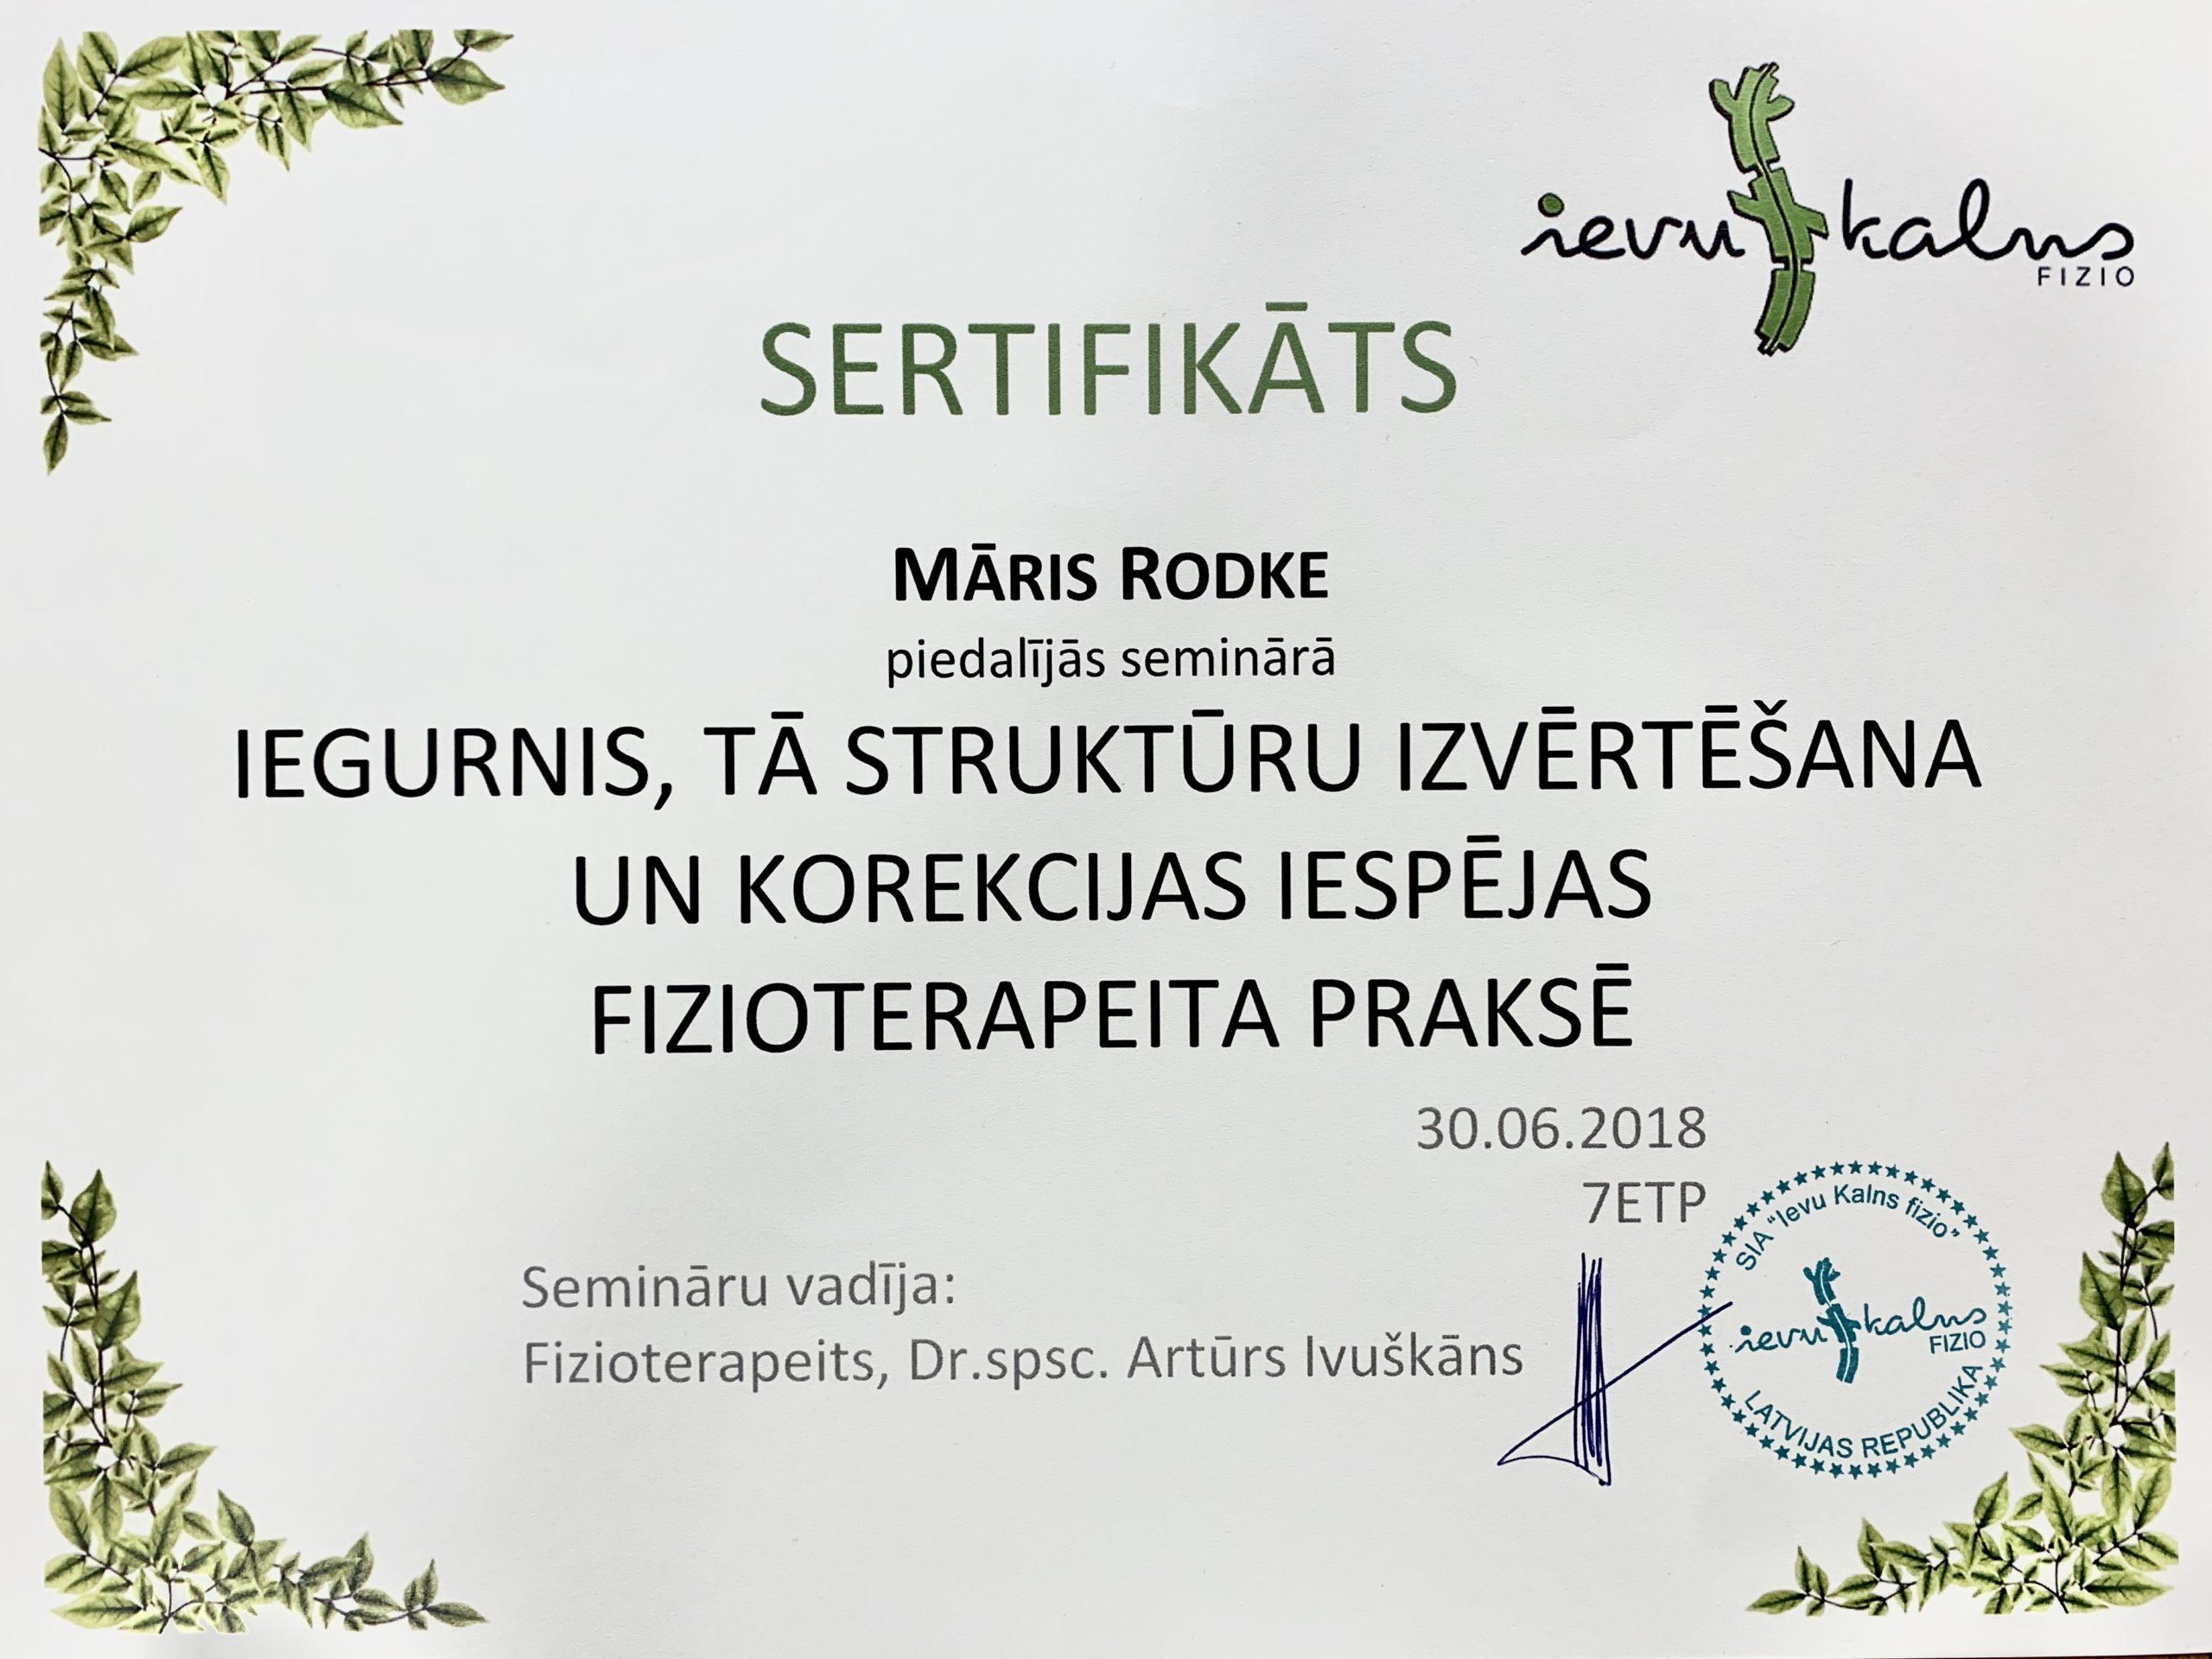 Sertifikāts - M. Rodke